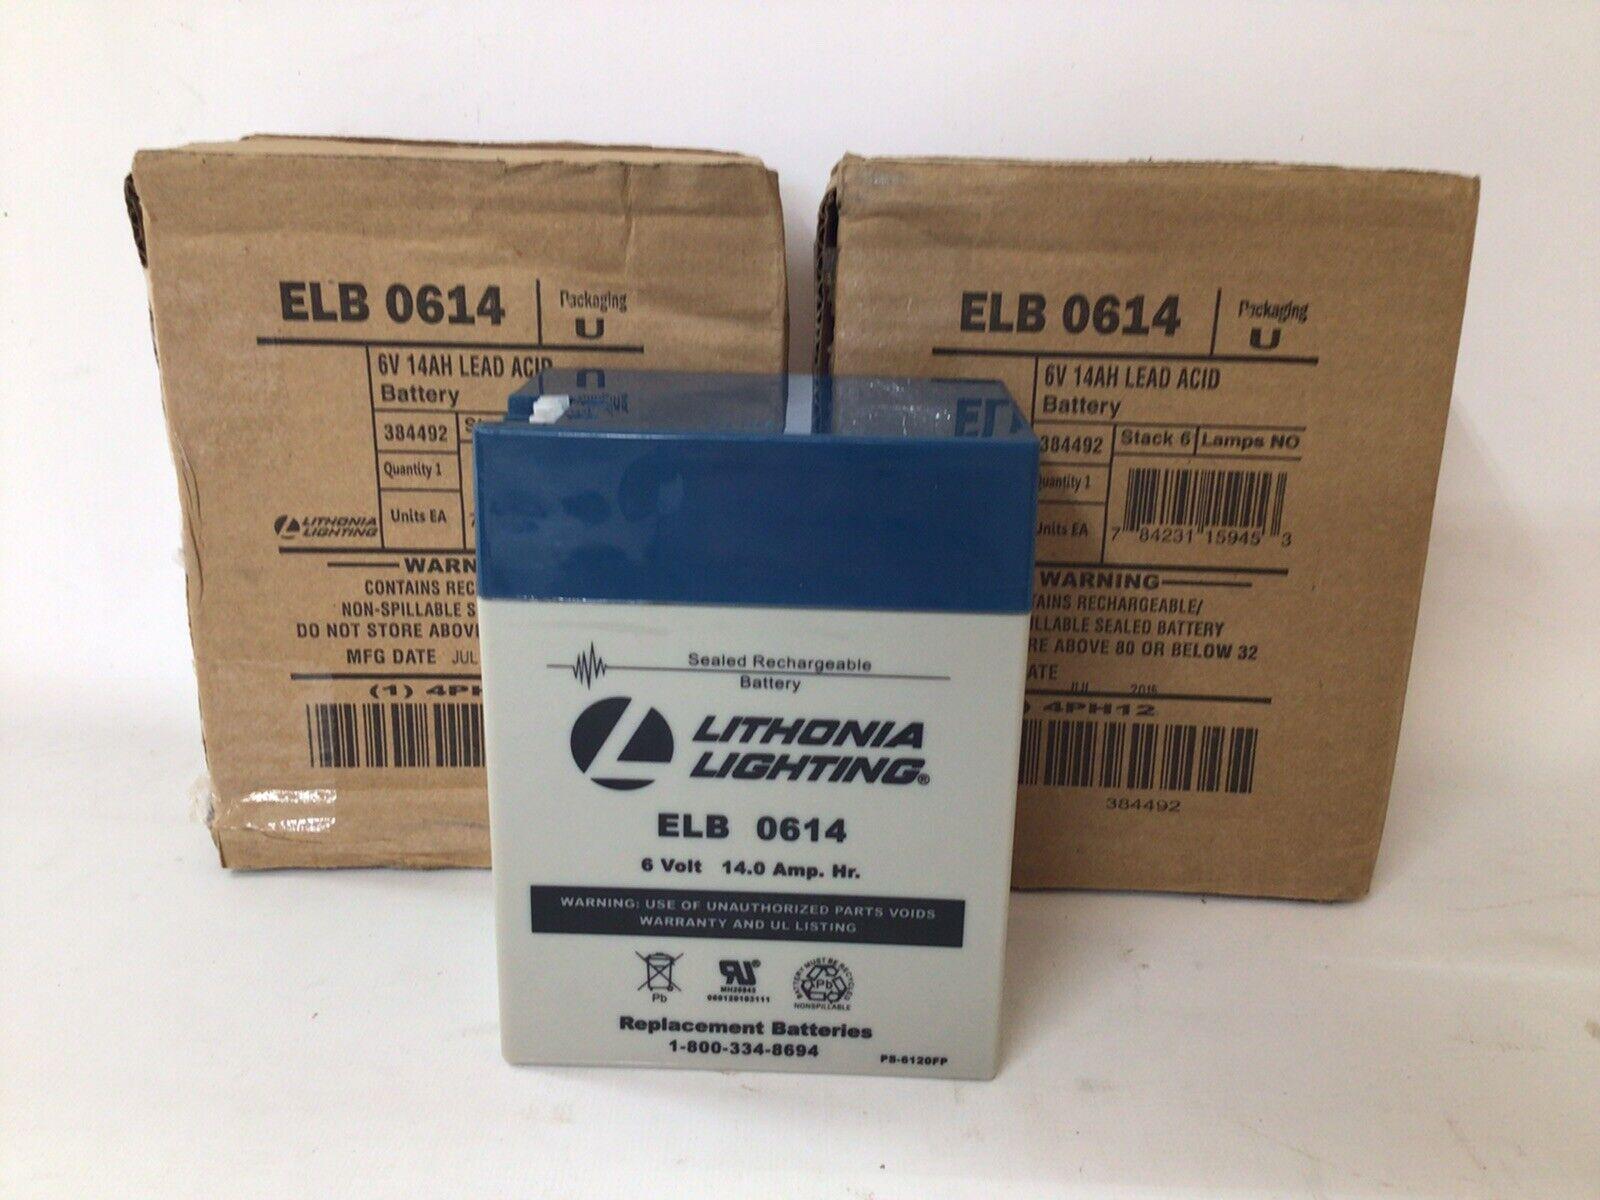 (Lot Of 2) Lithonia Lighting ELB0614 Sealed Rechargable Battery 6 Volt 14 Amp